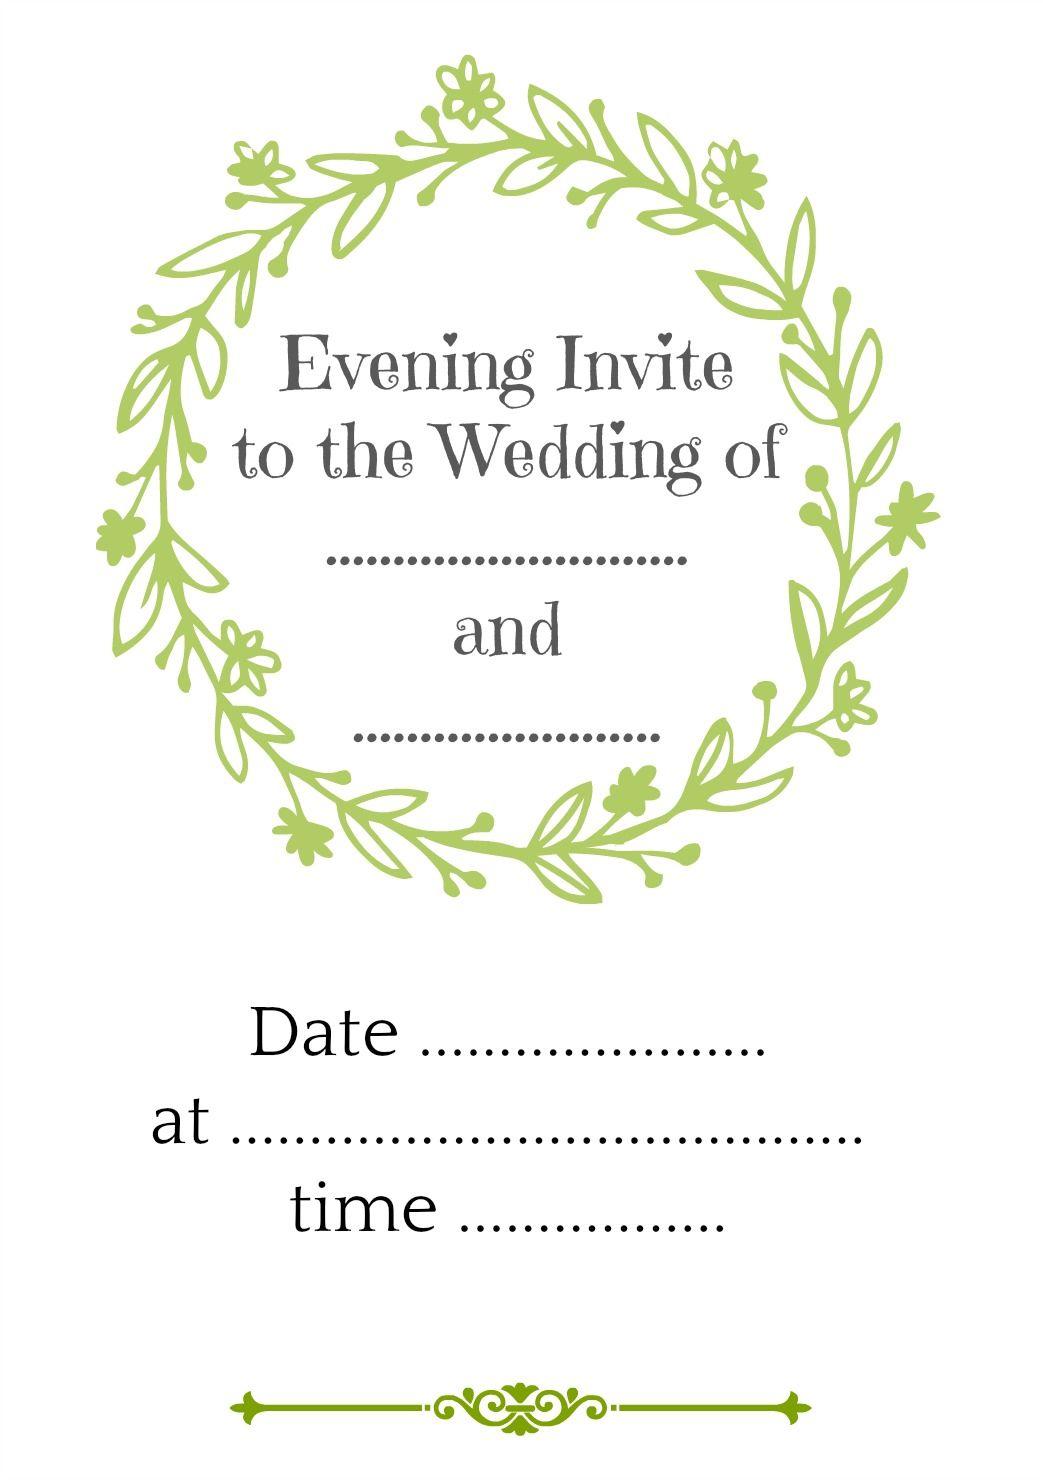 Evening Invitation